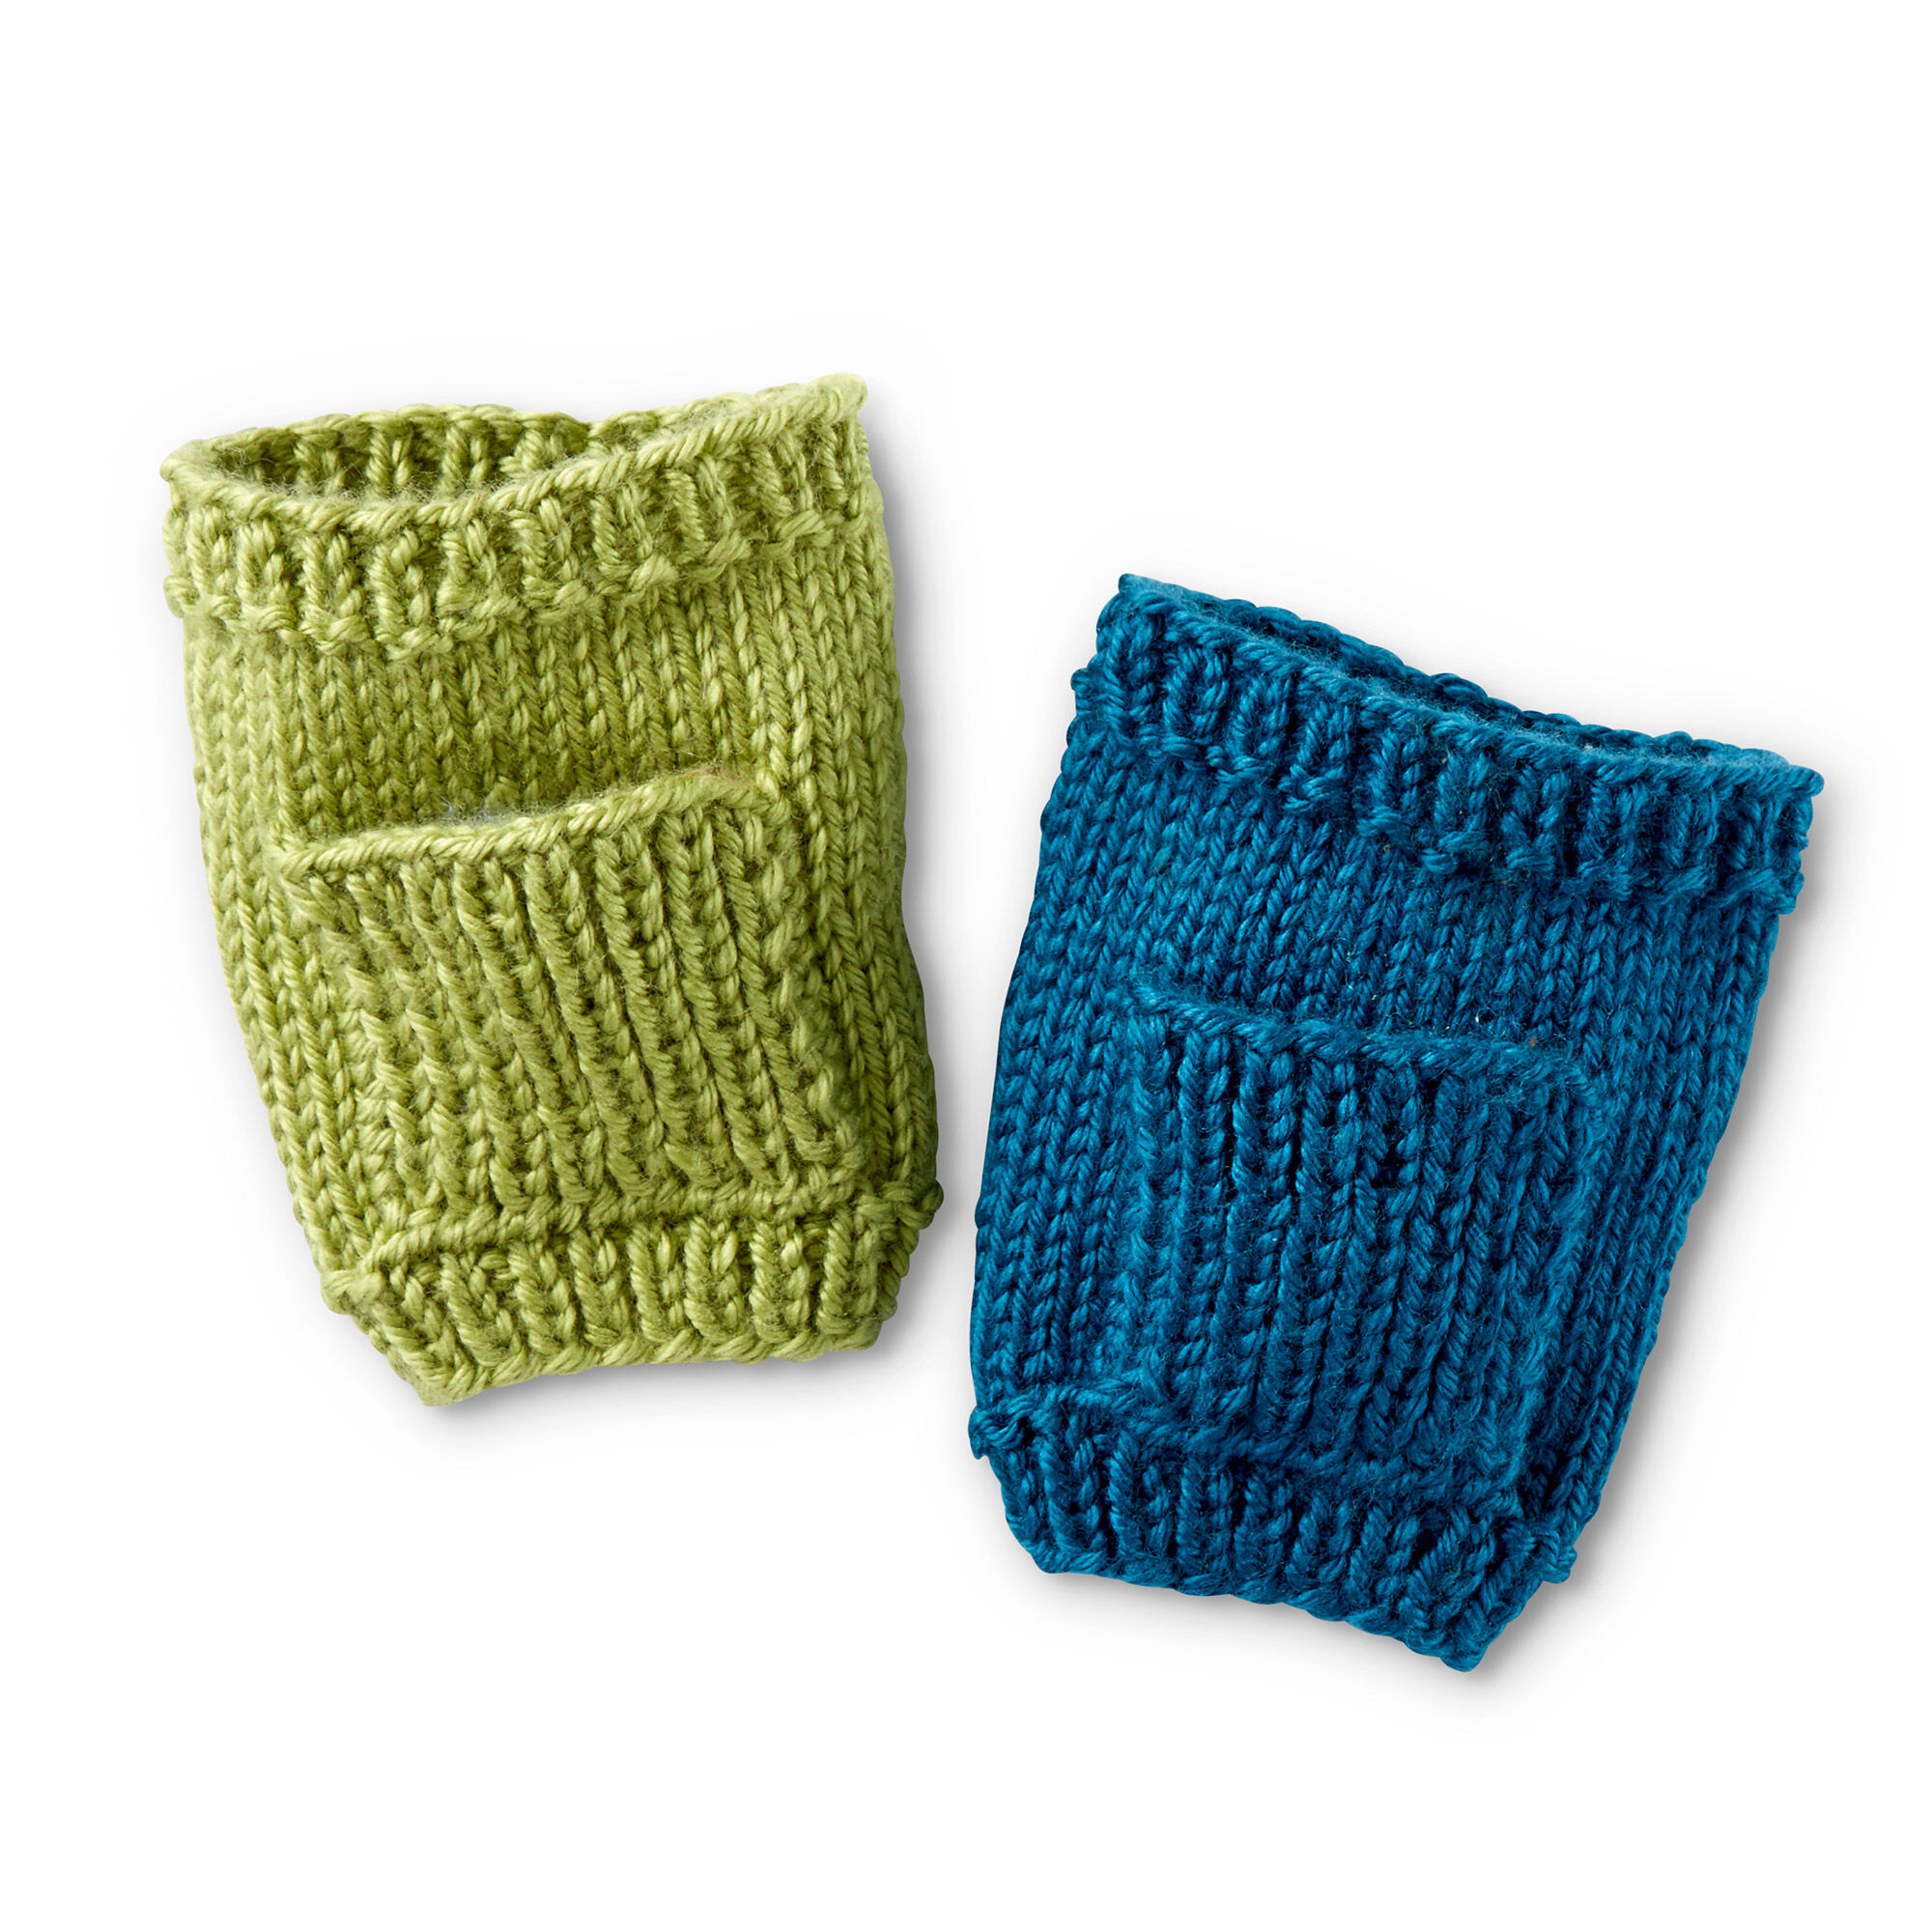 Caron Knit Pocket Cup Cozy | Yarnspirations